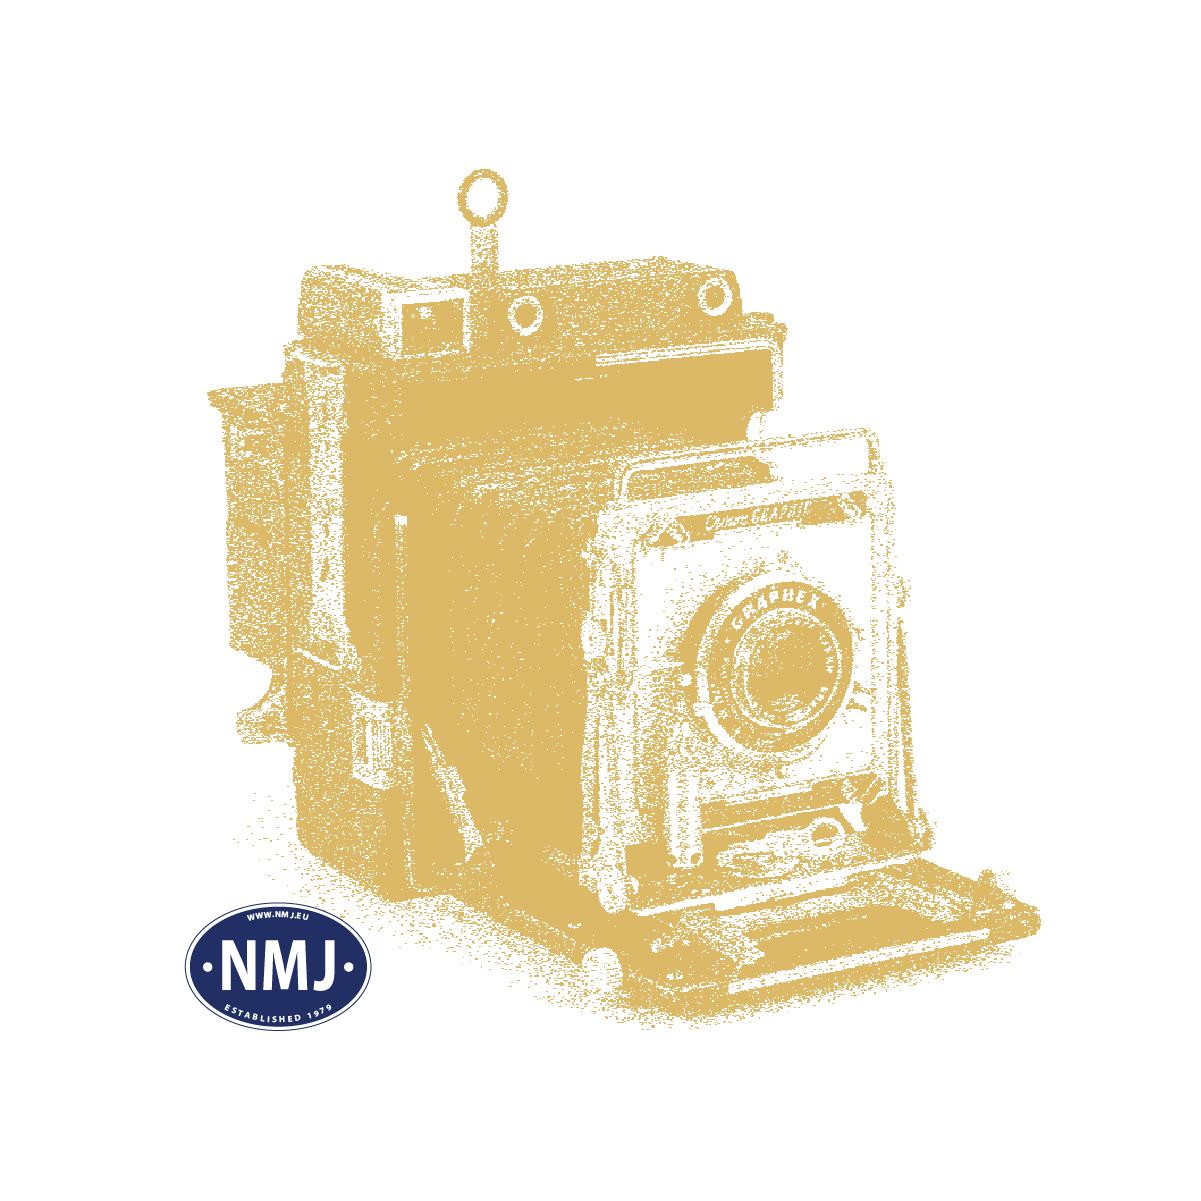 NMJ0.21508 - NMJ Superline Modell des Personen/Gepäckwagens BF10.21508 der NSB, Spur 0